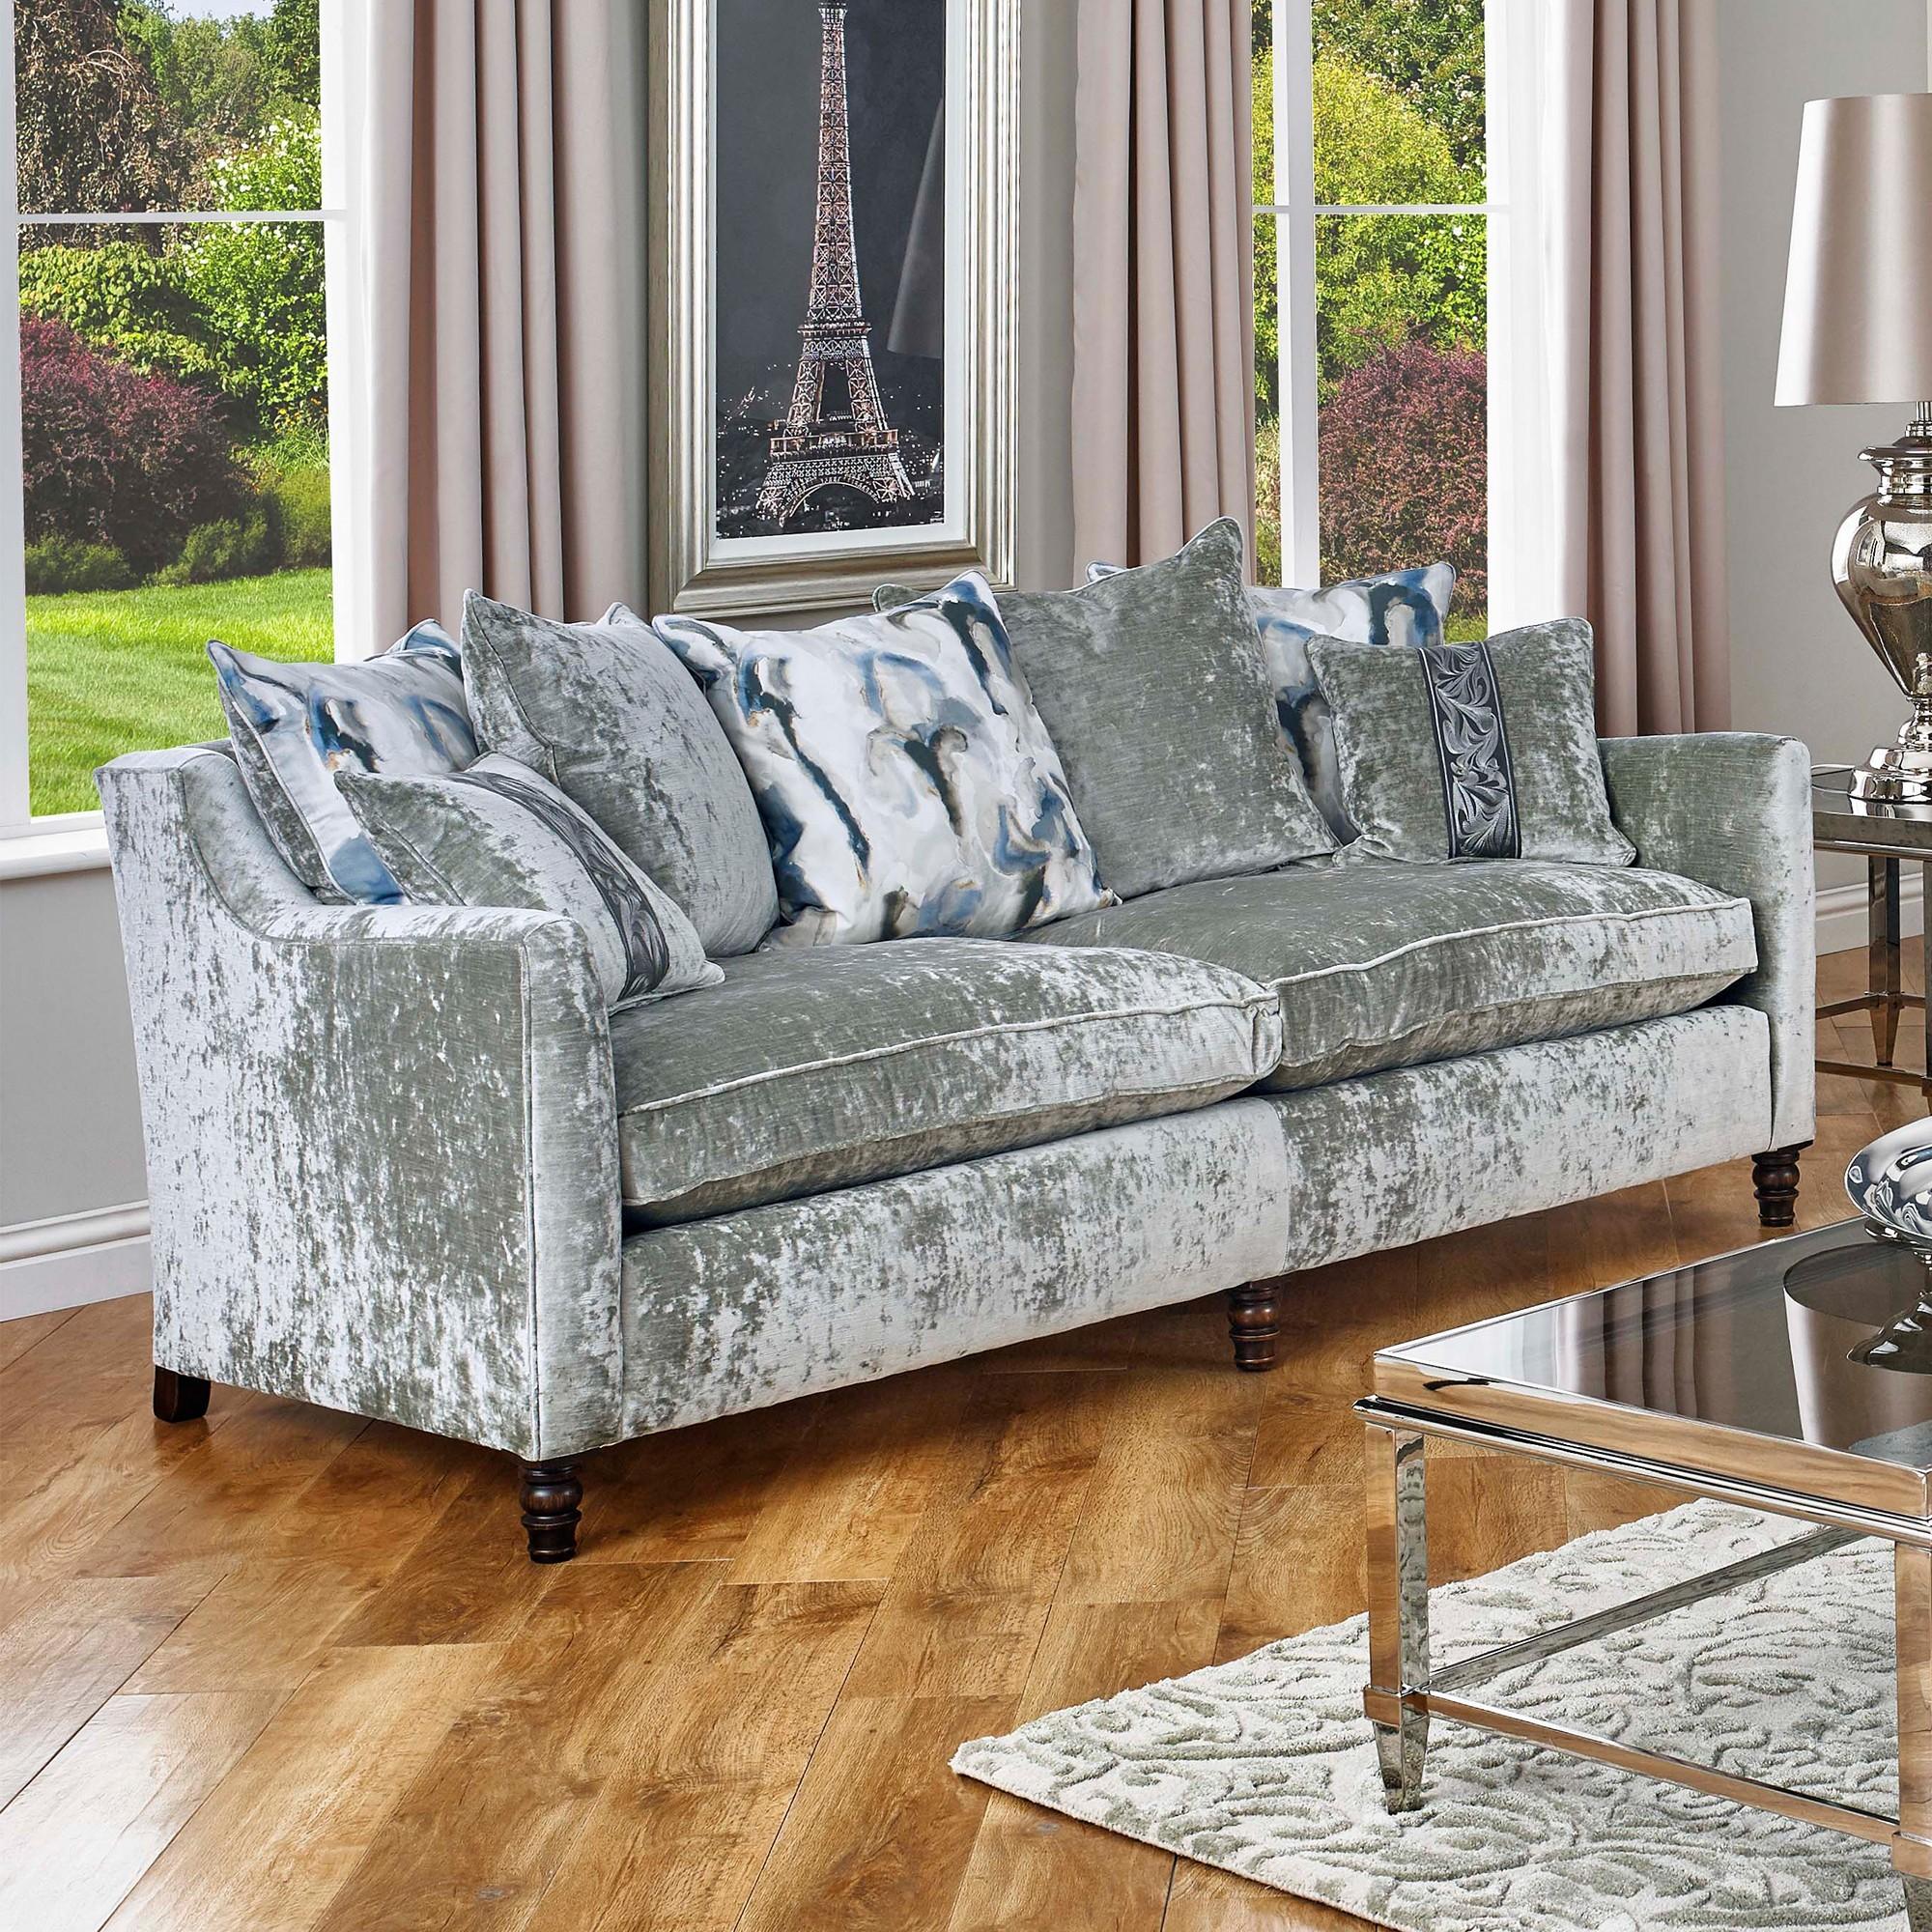 Marvelous Duresta Hoxton Large Sofa